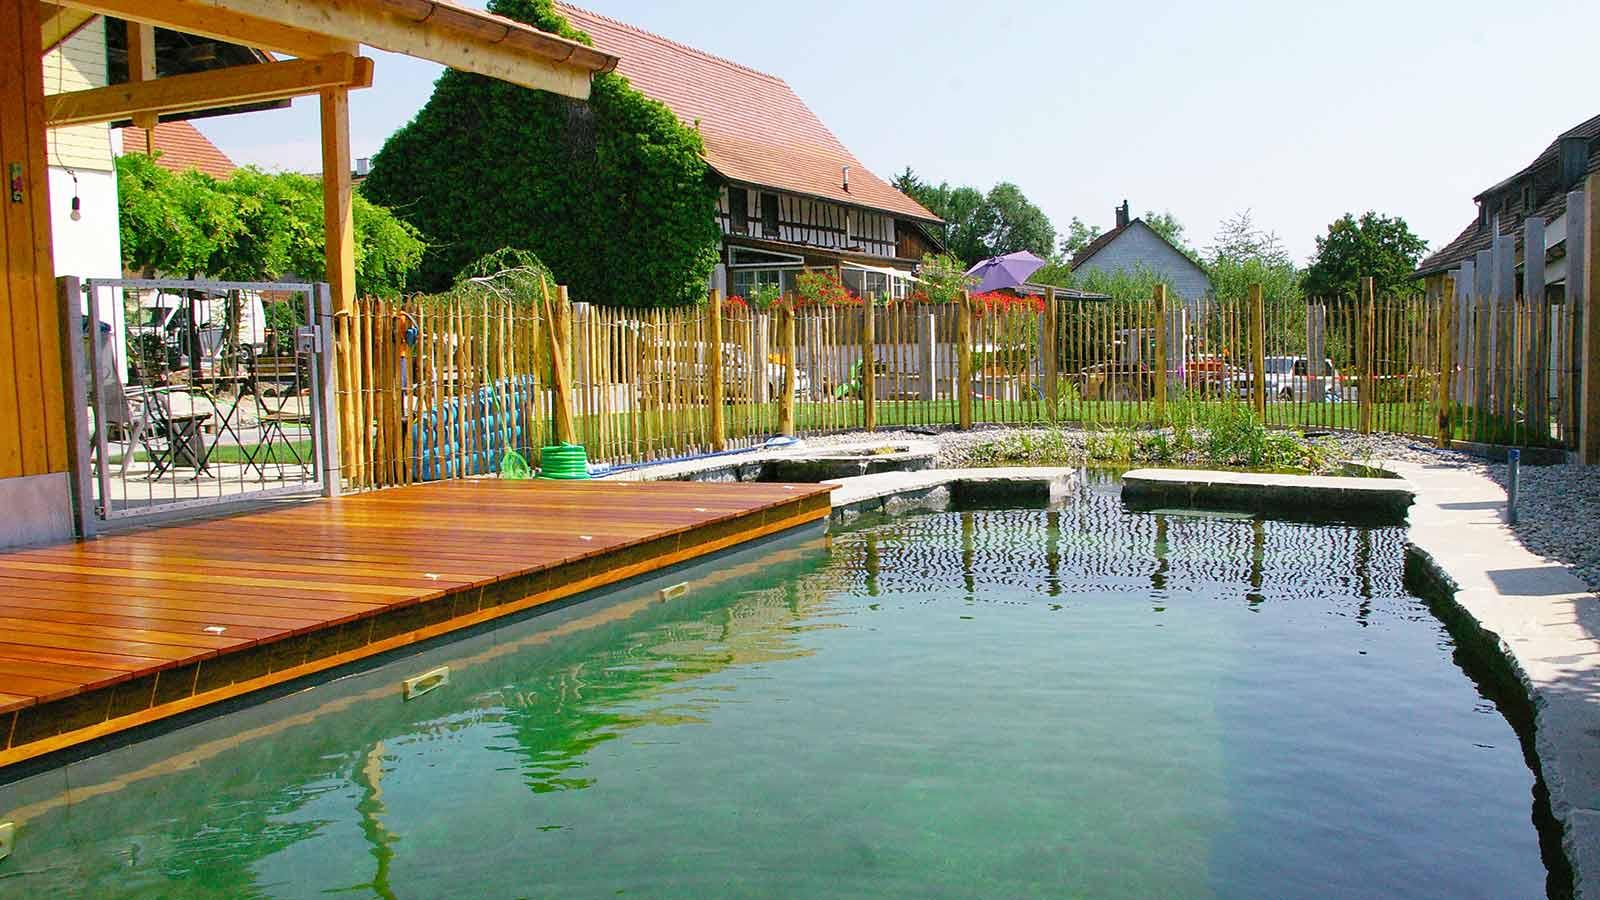 meier-gartenbau-naturapool-galerie-pool-haus-holz | meier gartenbau ag